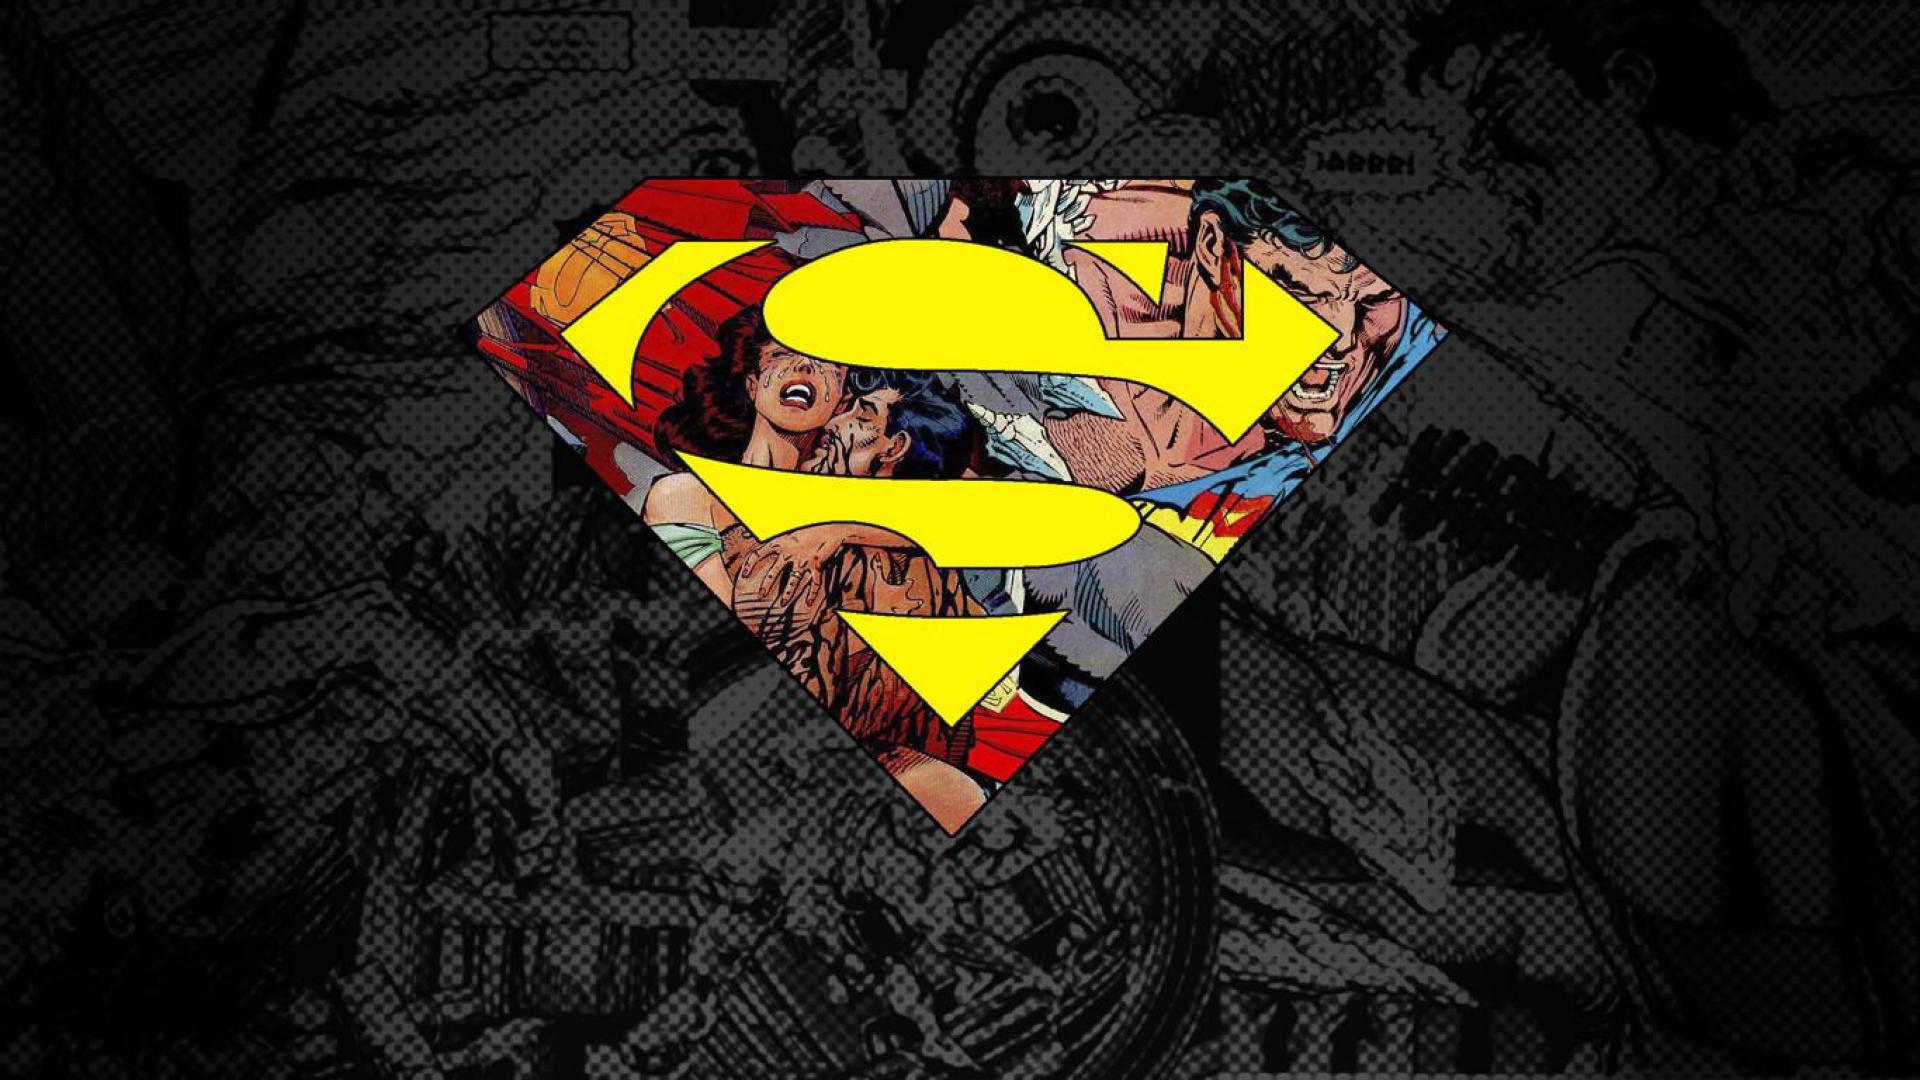 Superman logo hd wallpapers 1080p 60 images 1920x1080 hd pics photos abstract superman logo hd hd quality desktop background wallpaper voltagebd Gallery